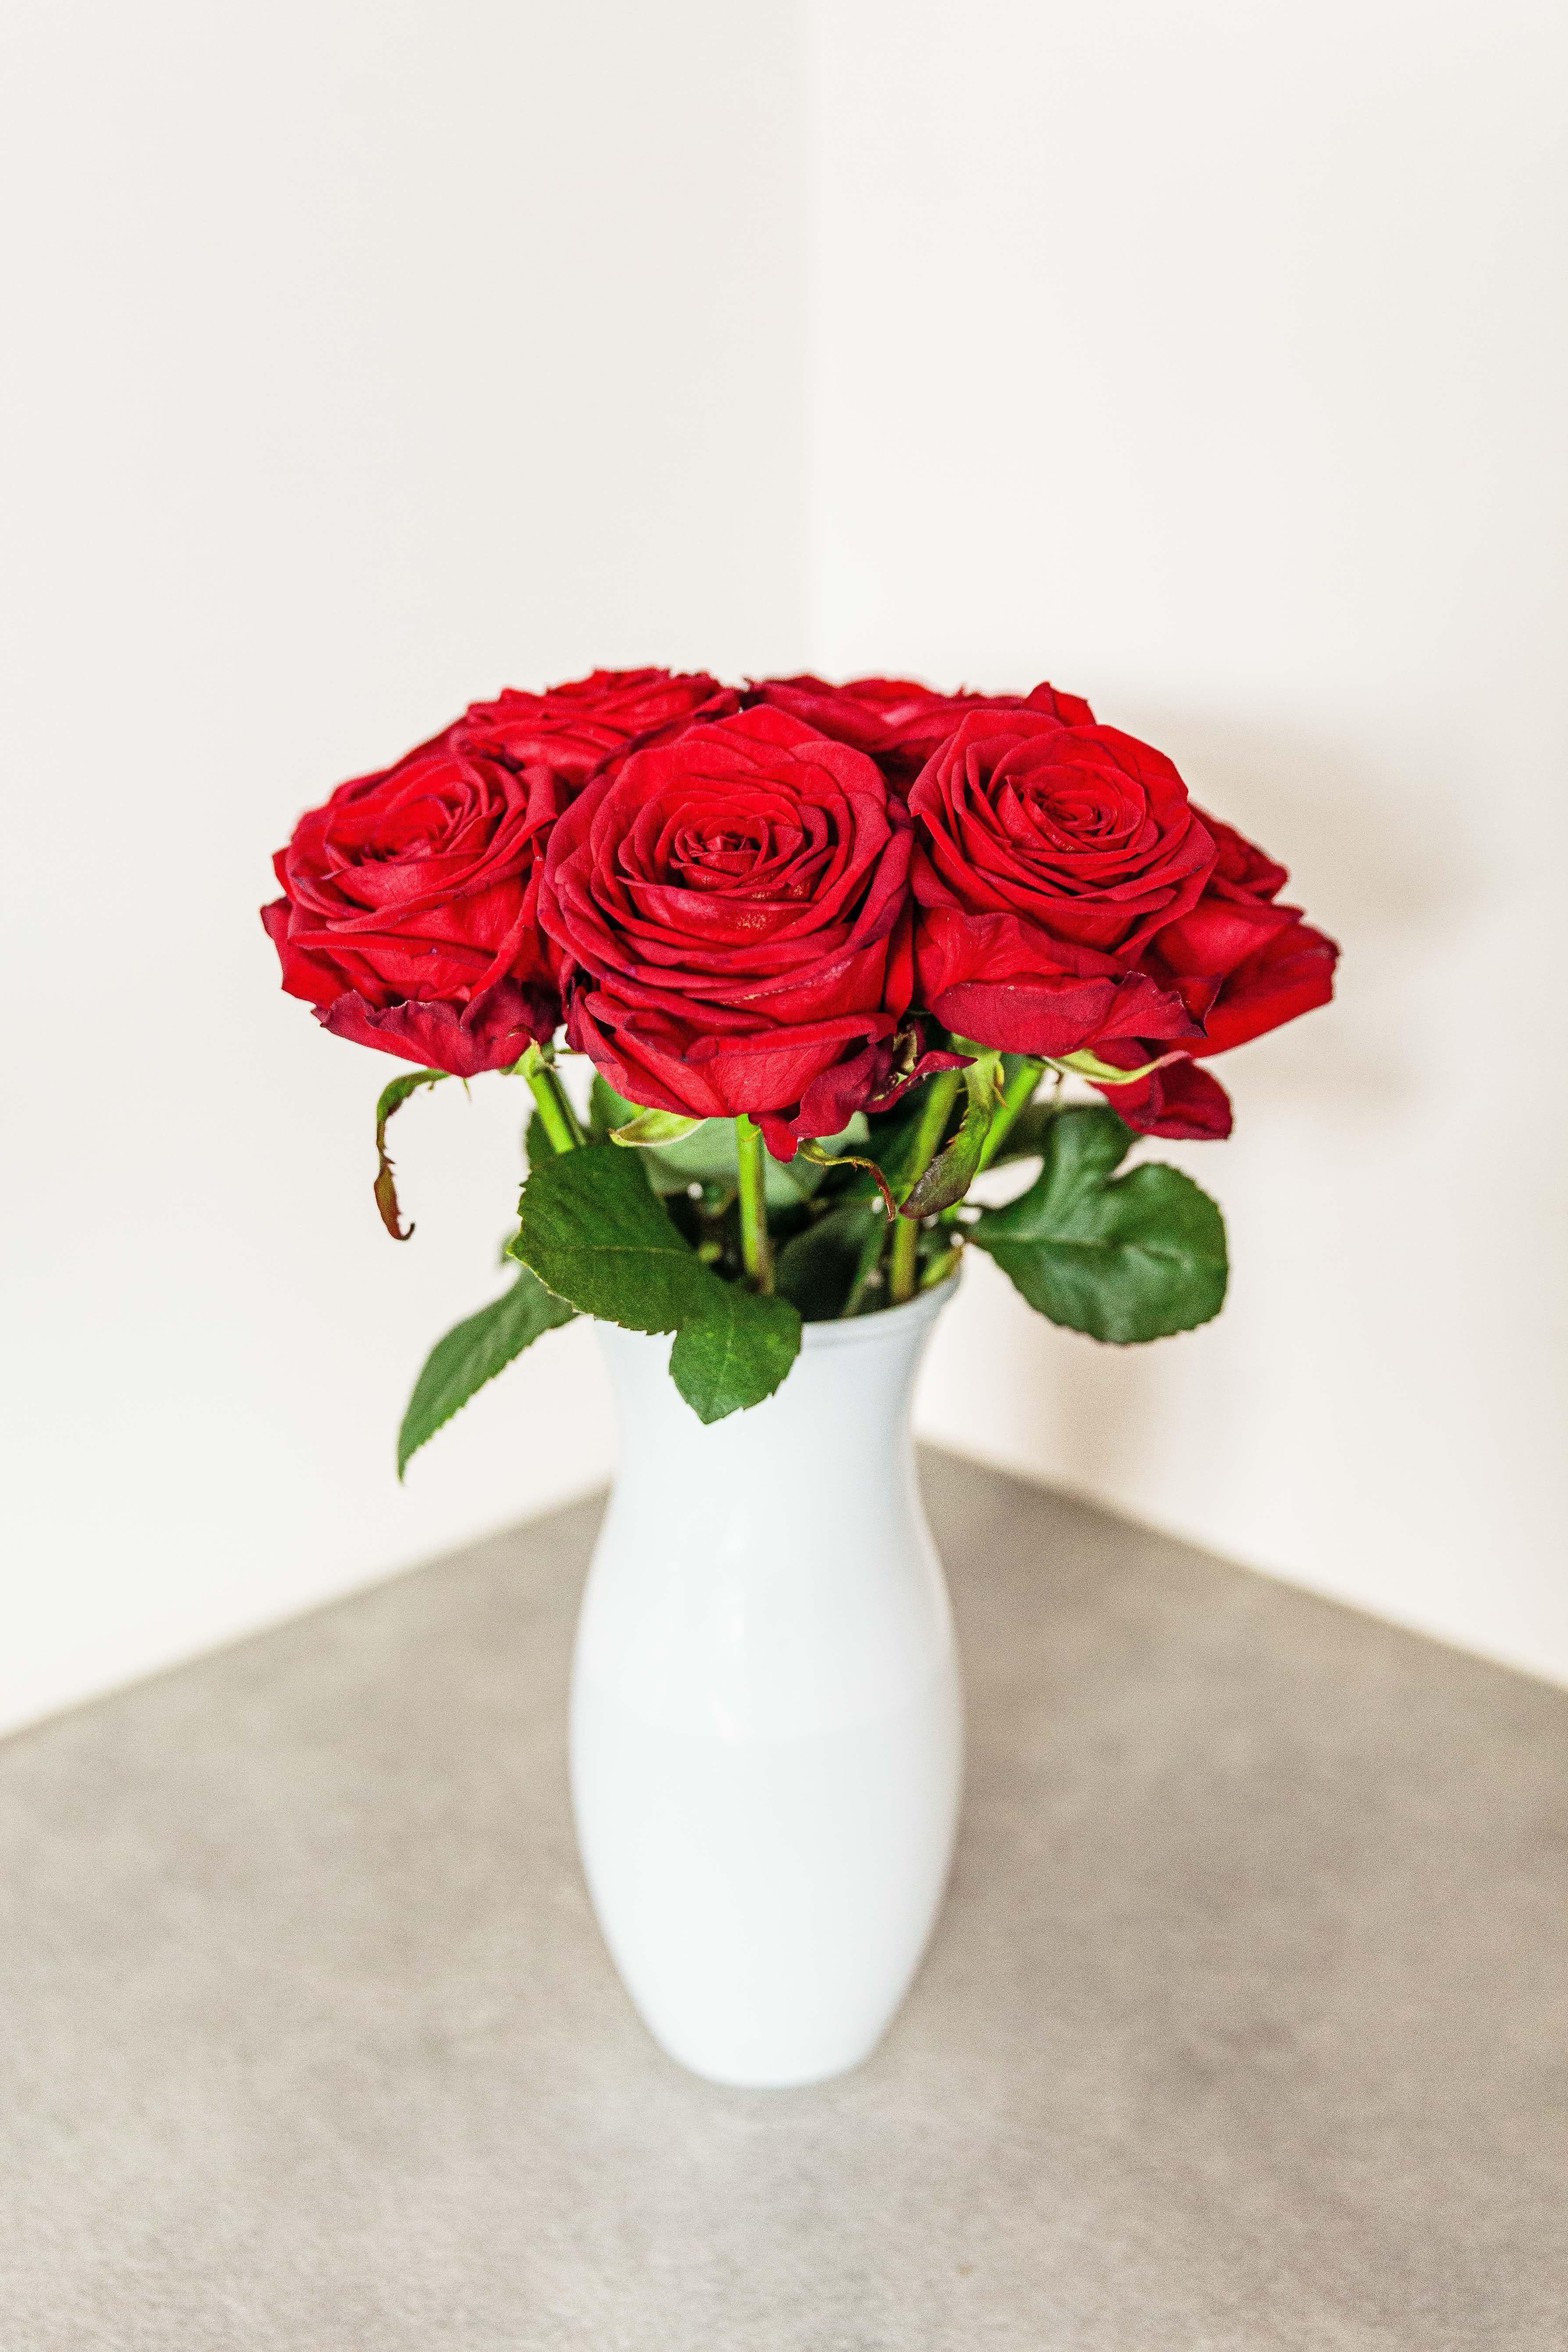 Red Rose Flowers In White Vase Photo Free Plant Image On Unsplash